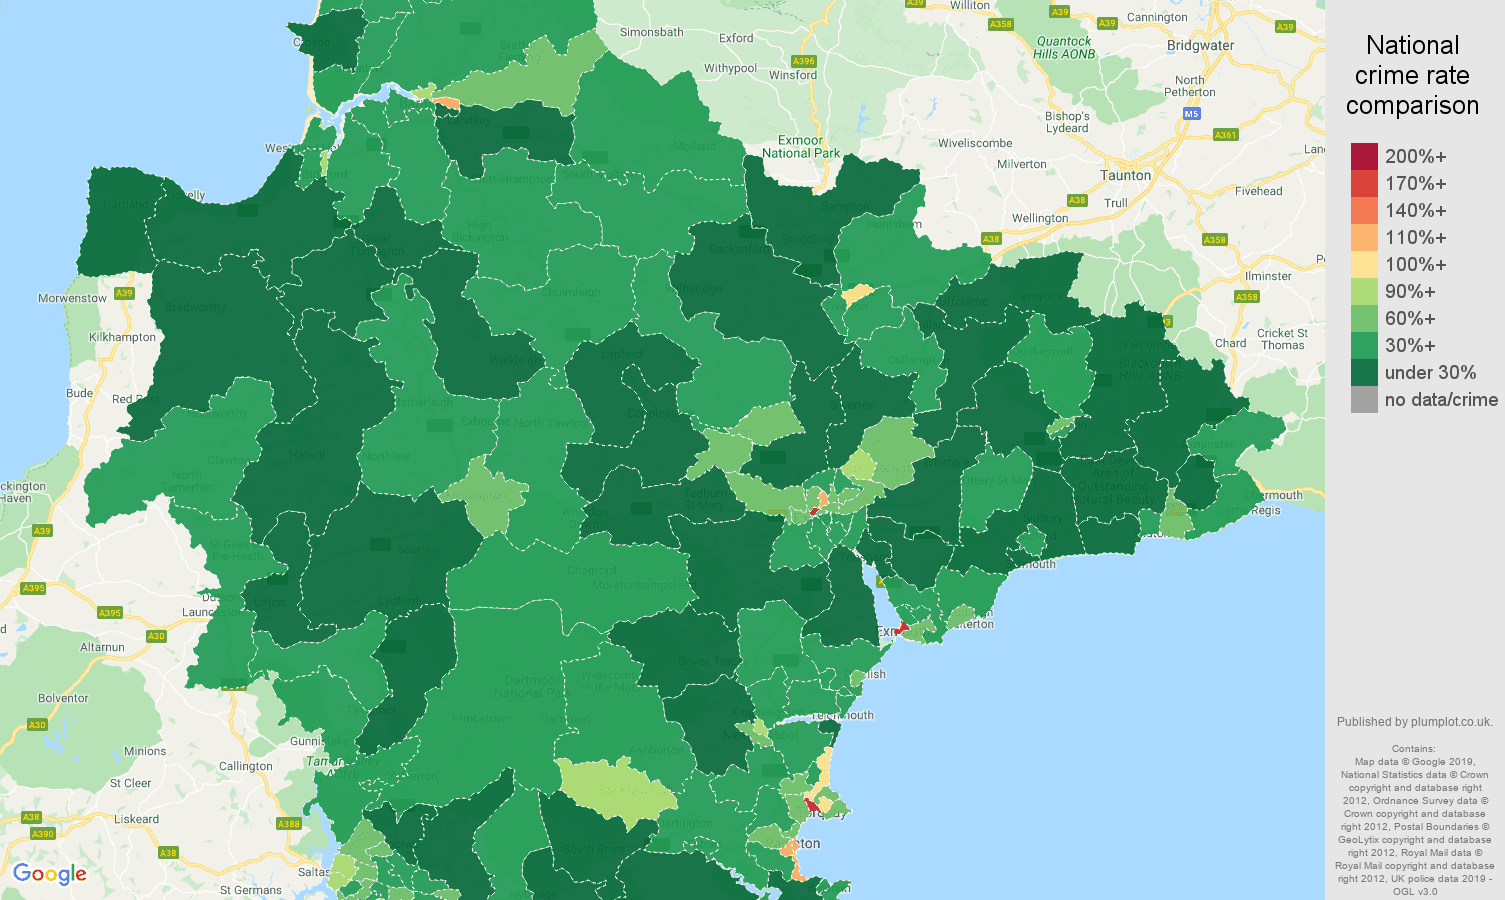 Devon public order crime rate comparison map